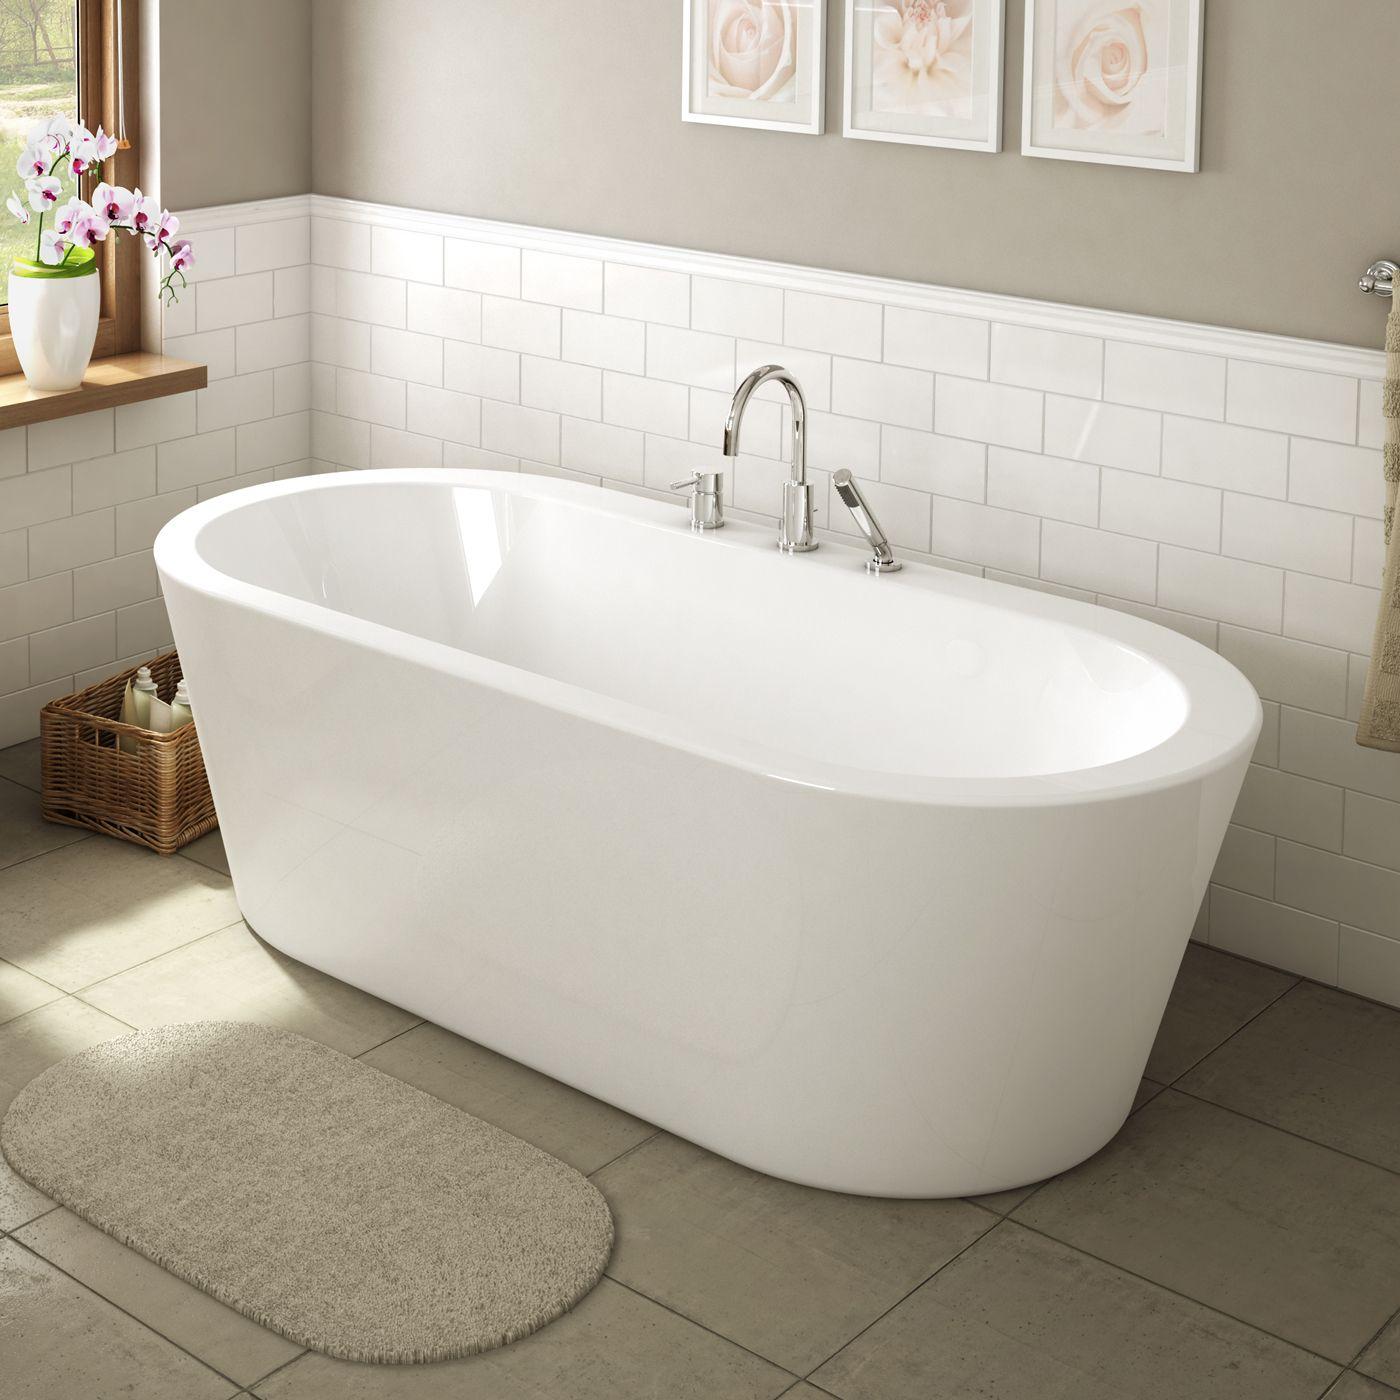 A Amp E Bath And Shower Una 71 In Glossy White Freestanding